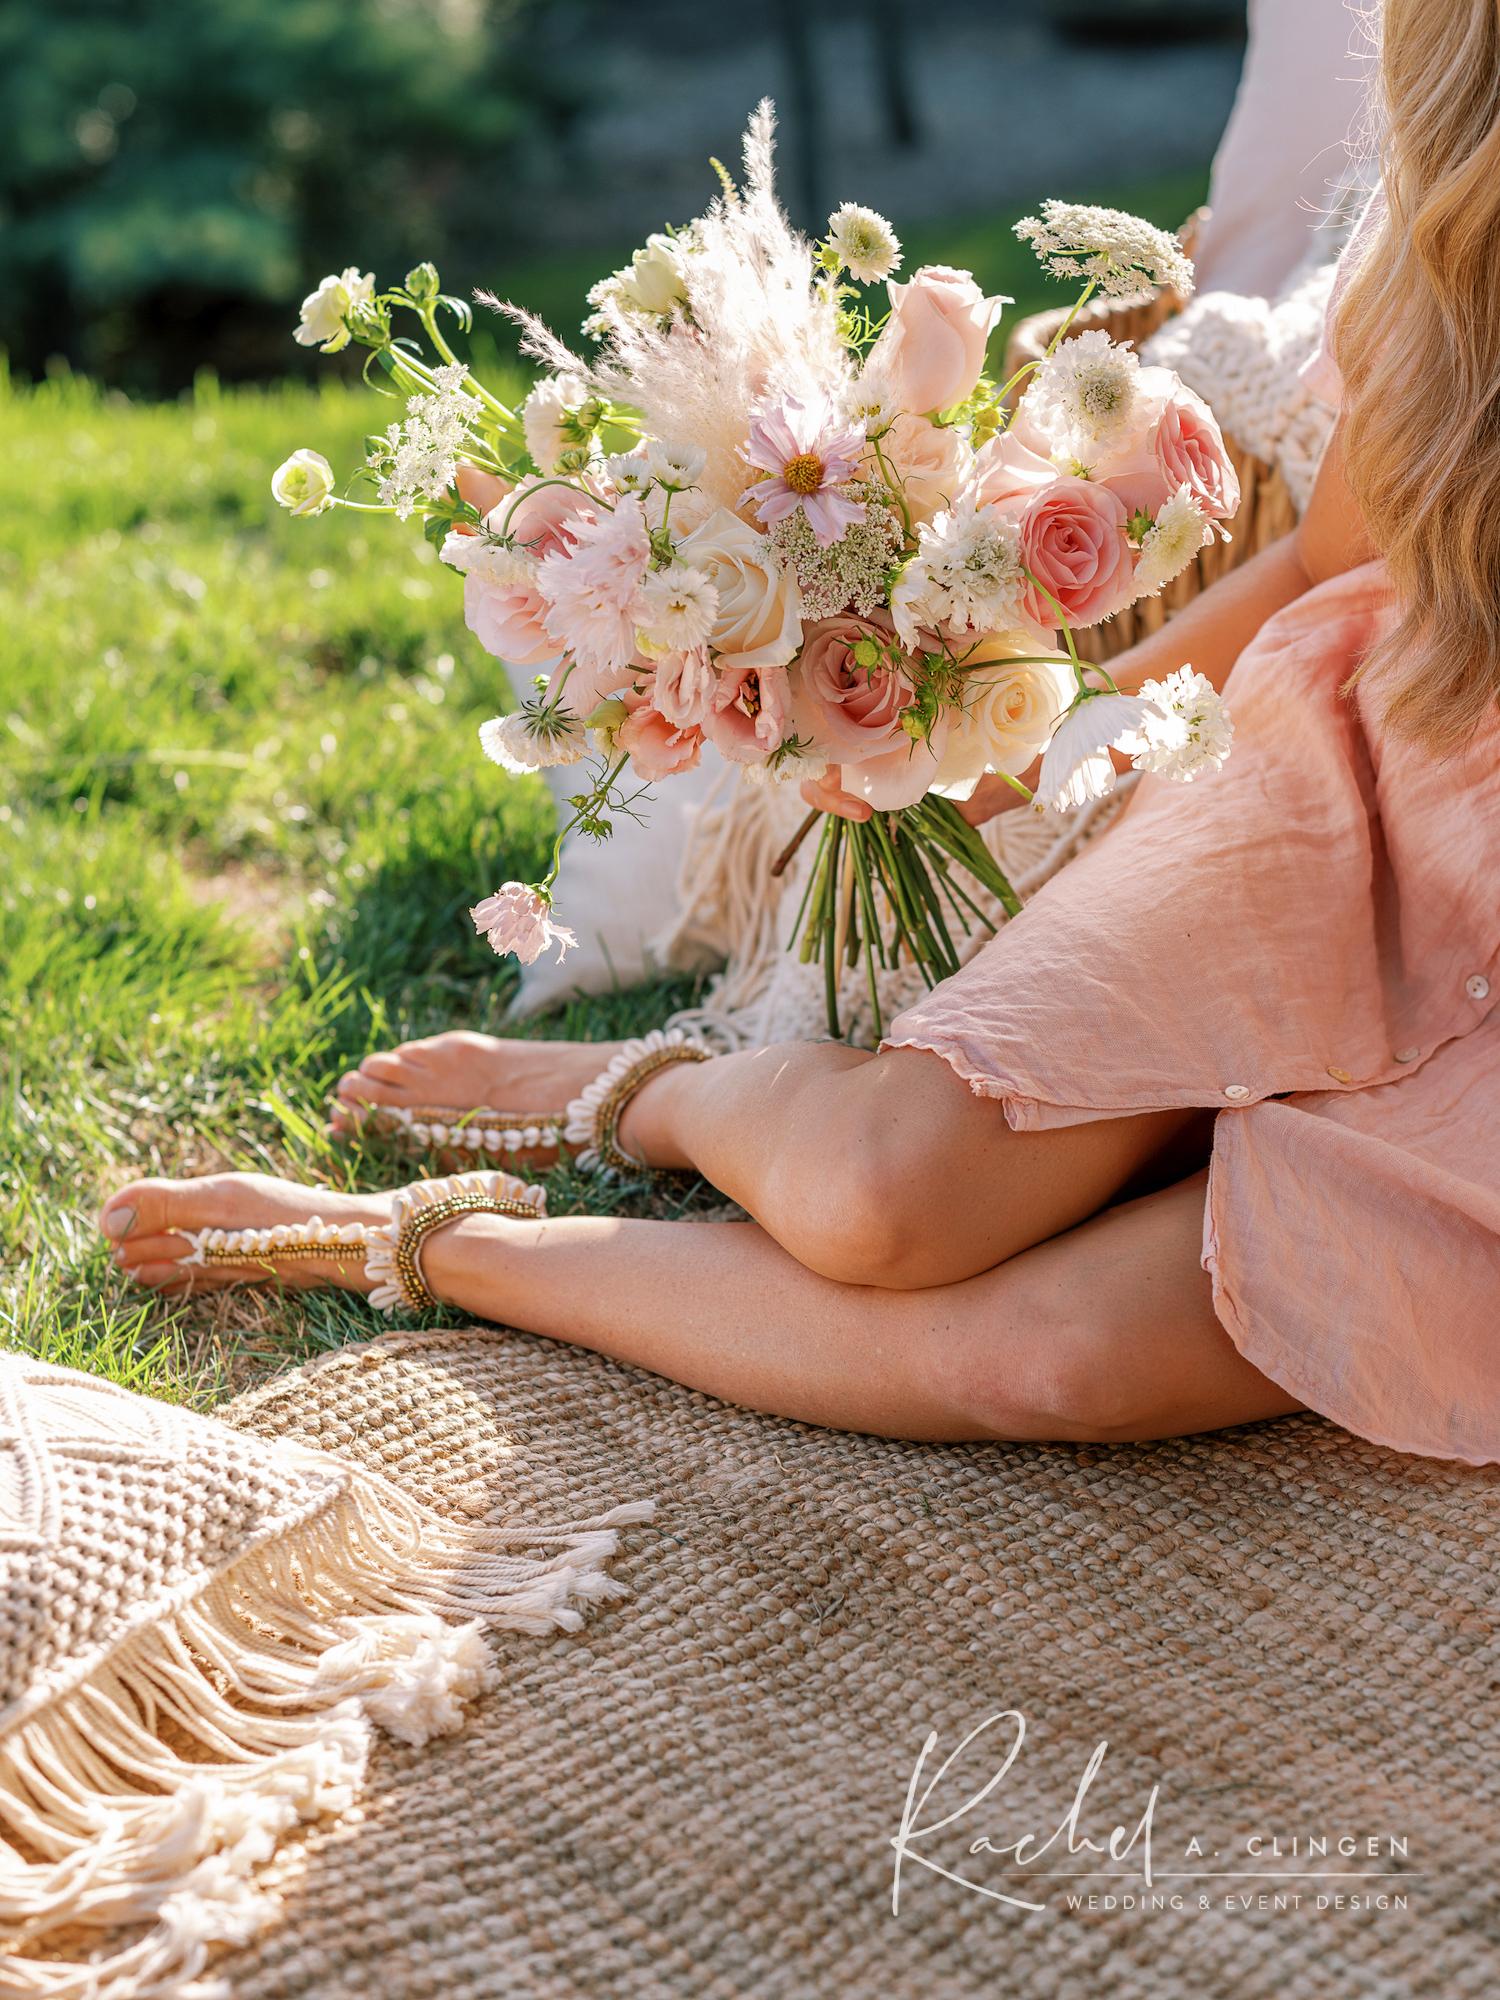 small intimate event design flowers muskoka toronto